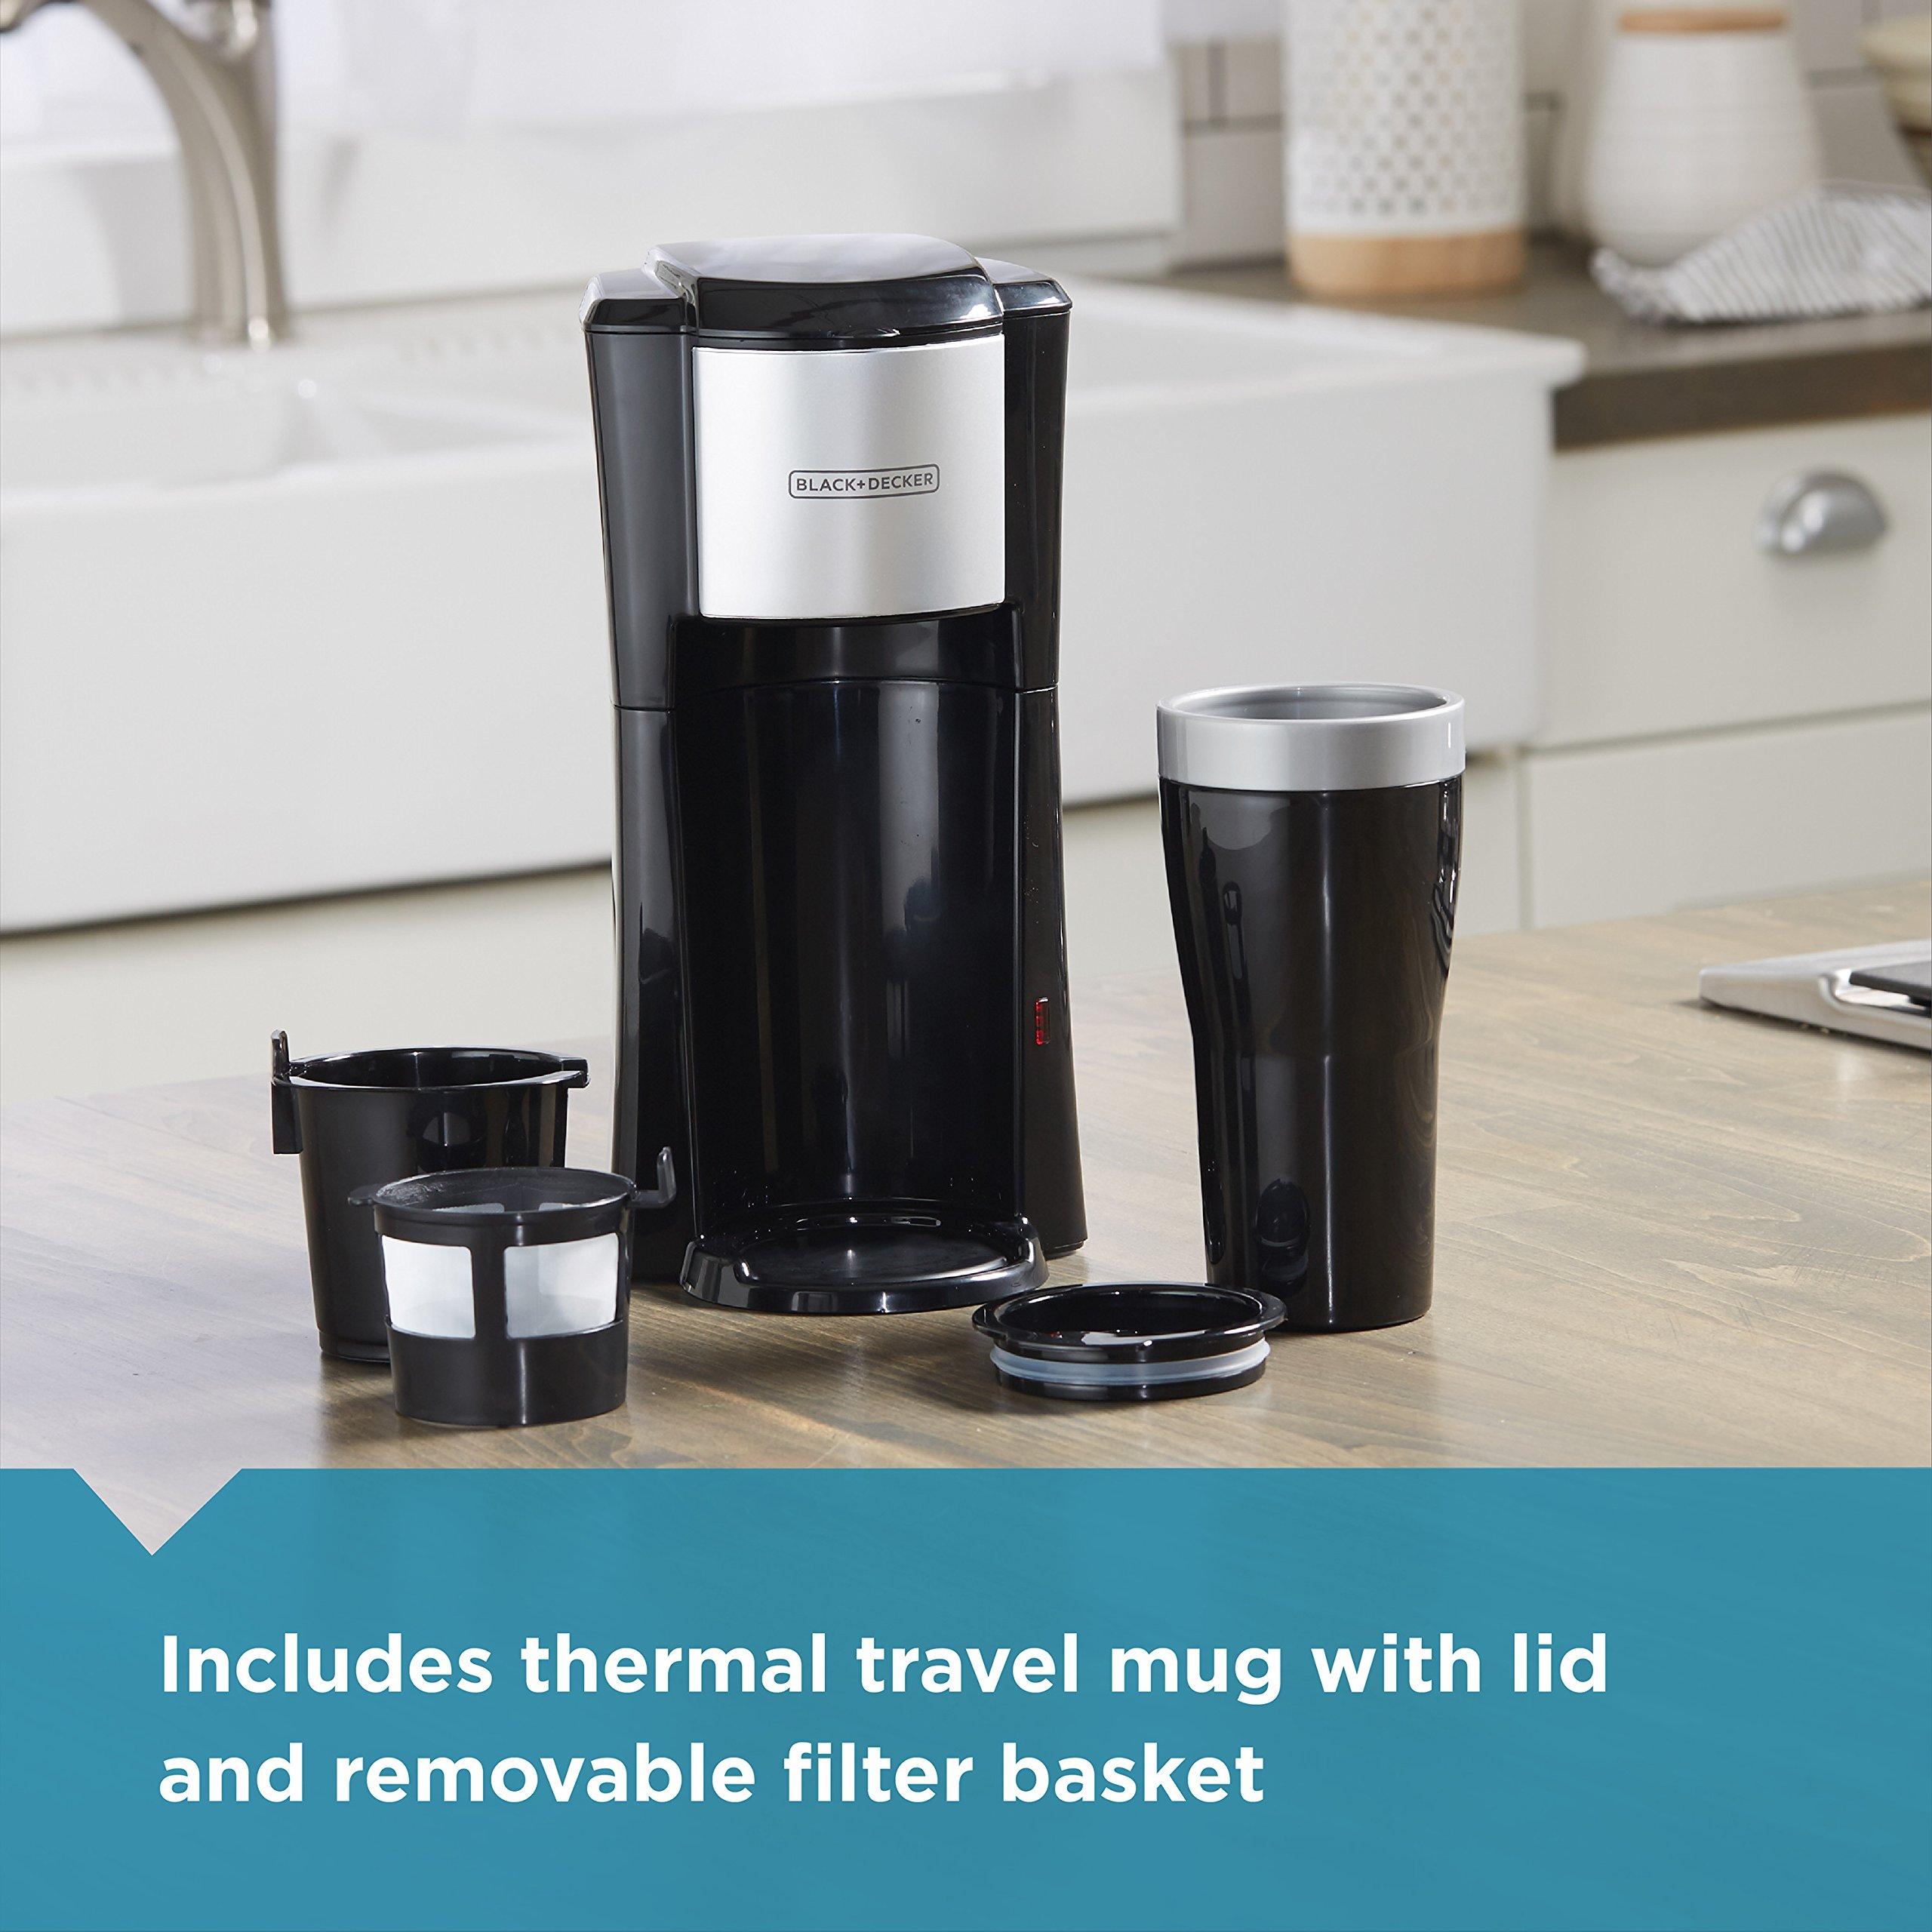 BLACK+DECKER Single Serve Coffeemaker, Black, CM618 by BLACK+DECKER (Image #4)